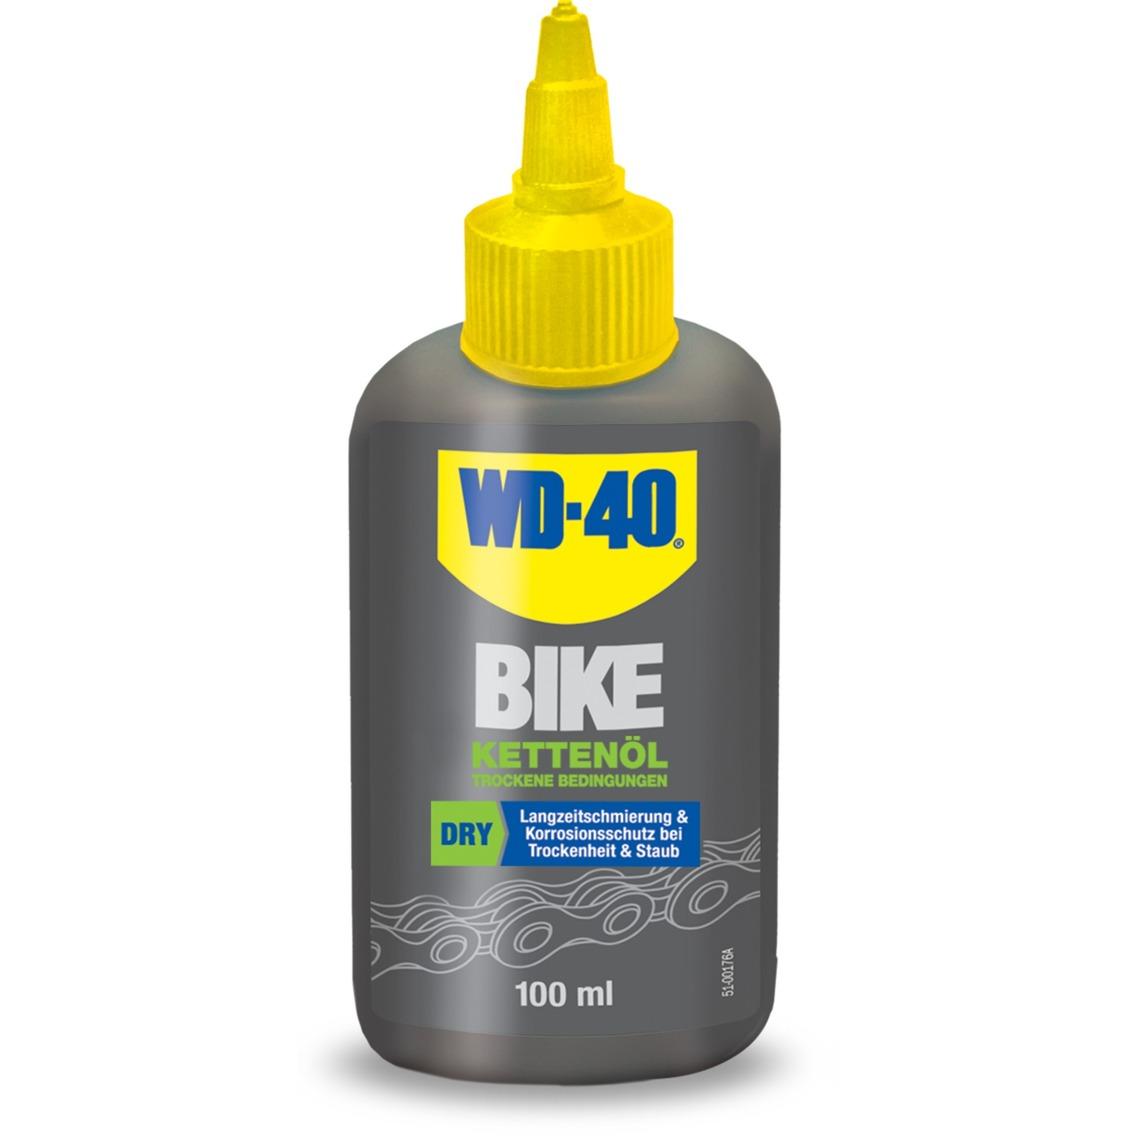 49695 lubricante para bicicletas Botella 100 ml, Aceite